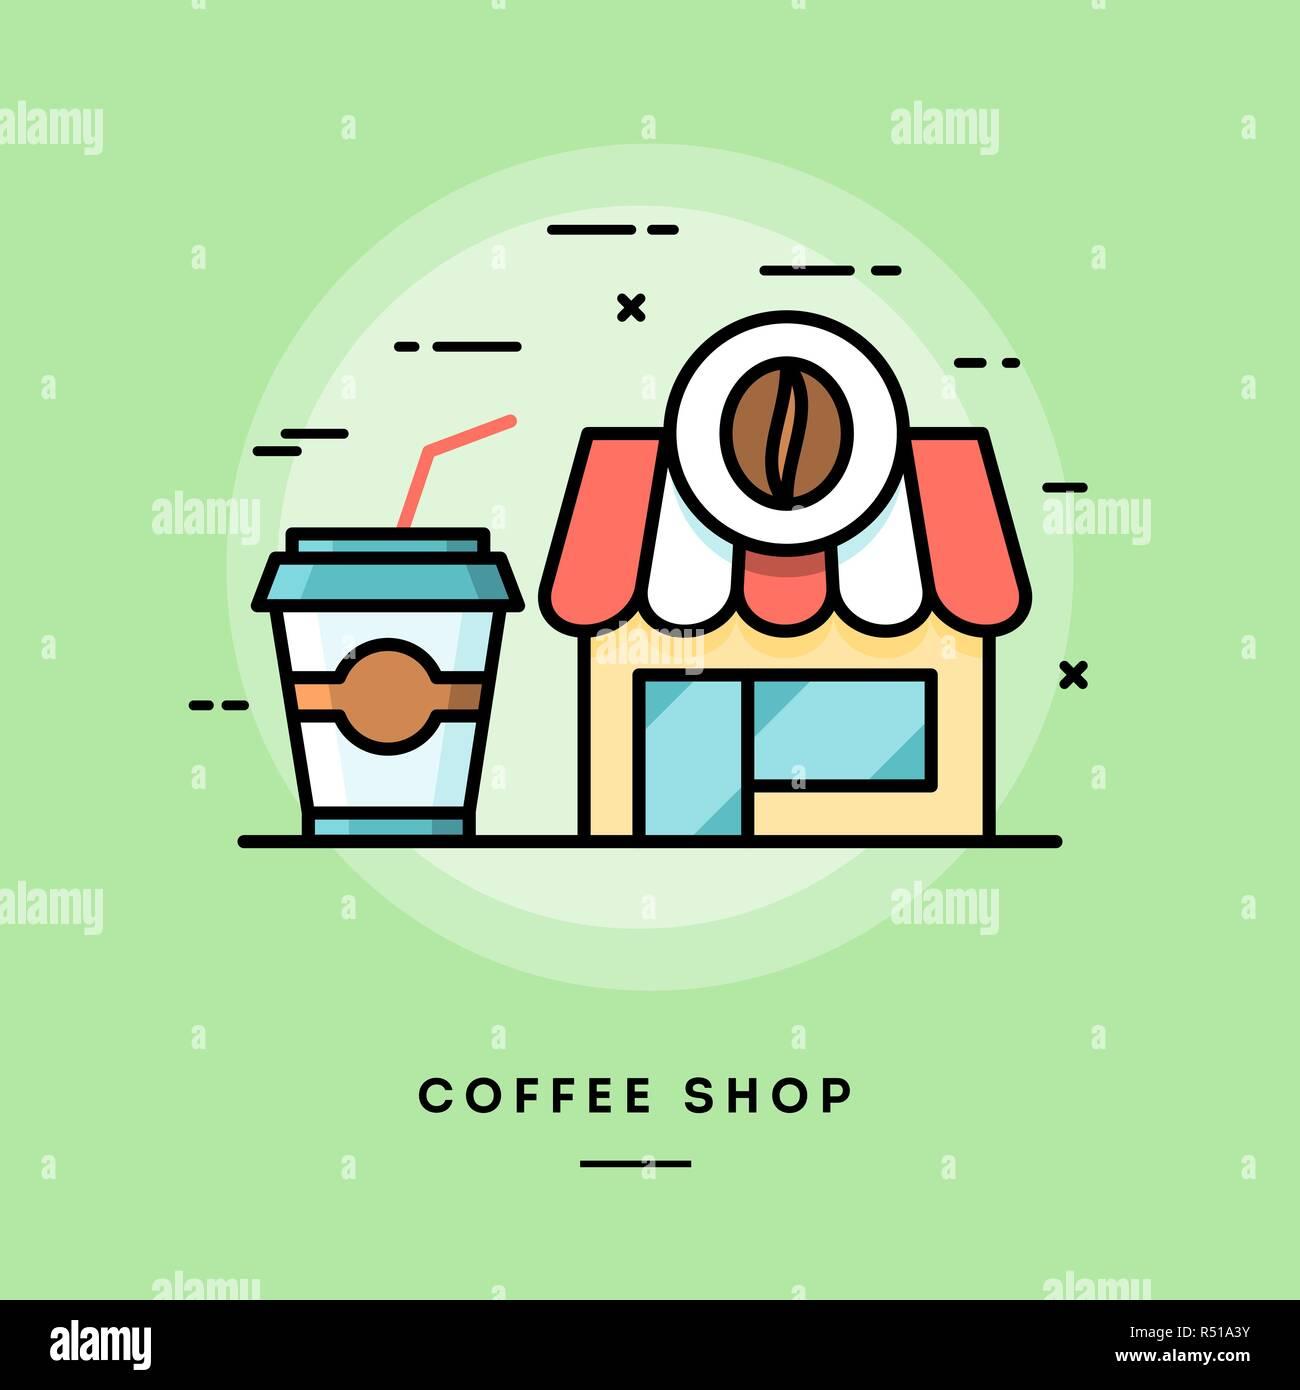 Coffee shop, flat design thin line banner - Stock Vector